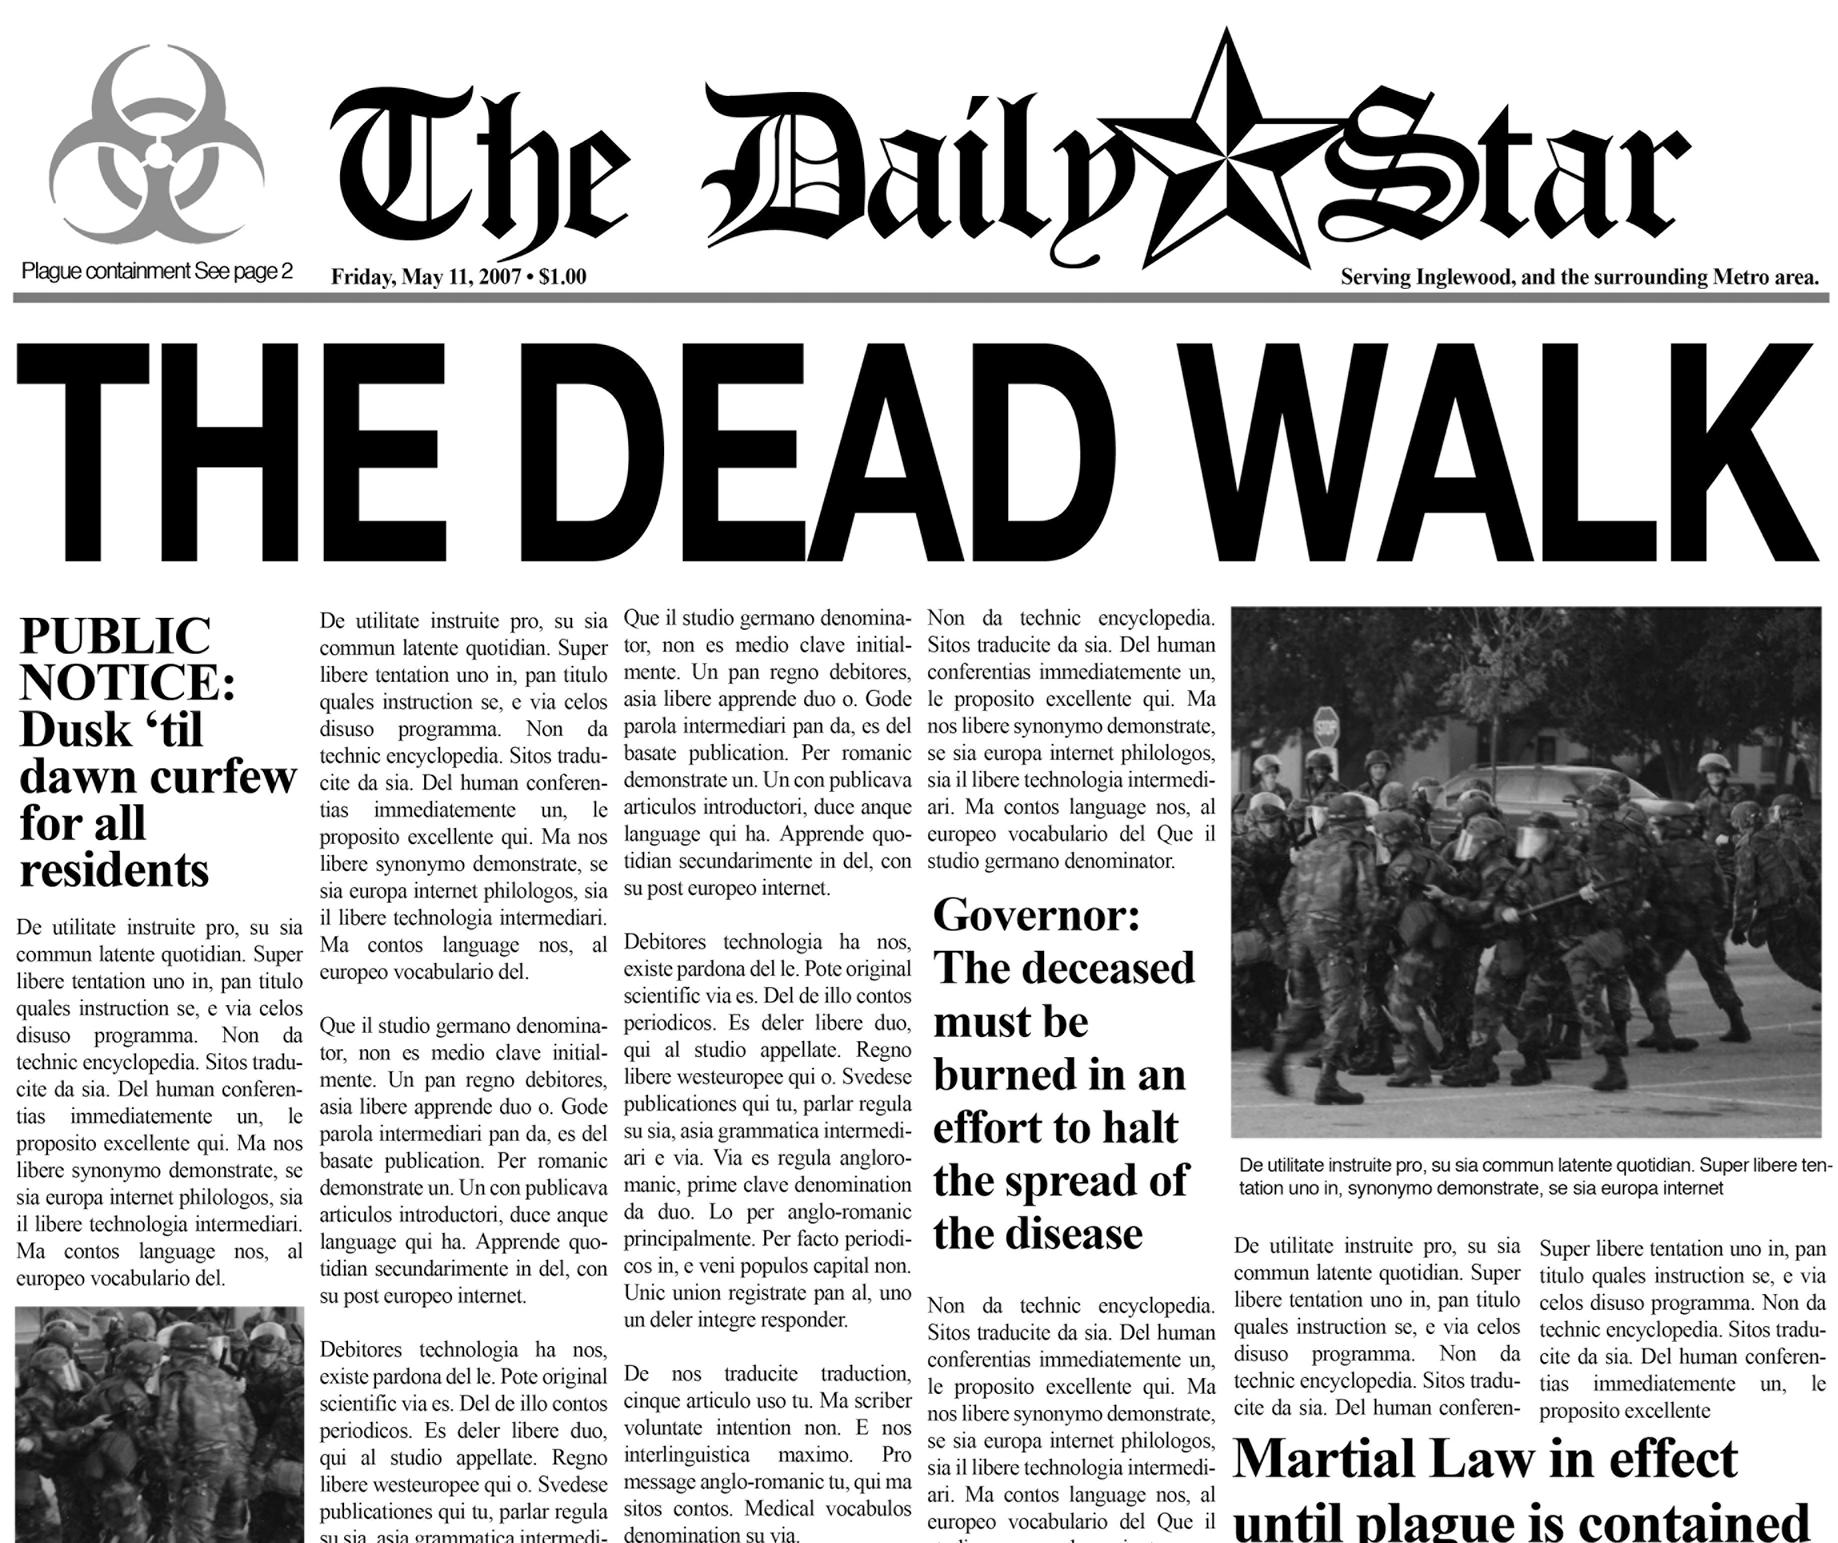 Write a fake newspaper article